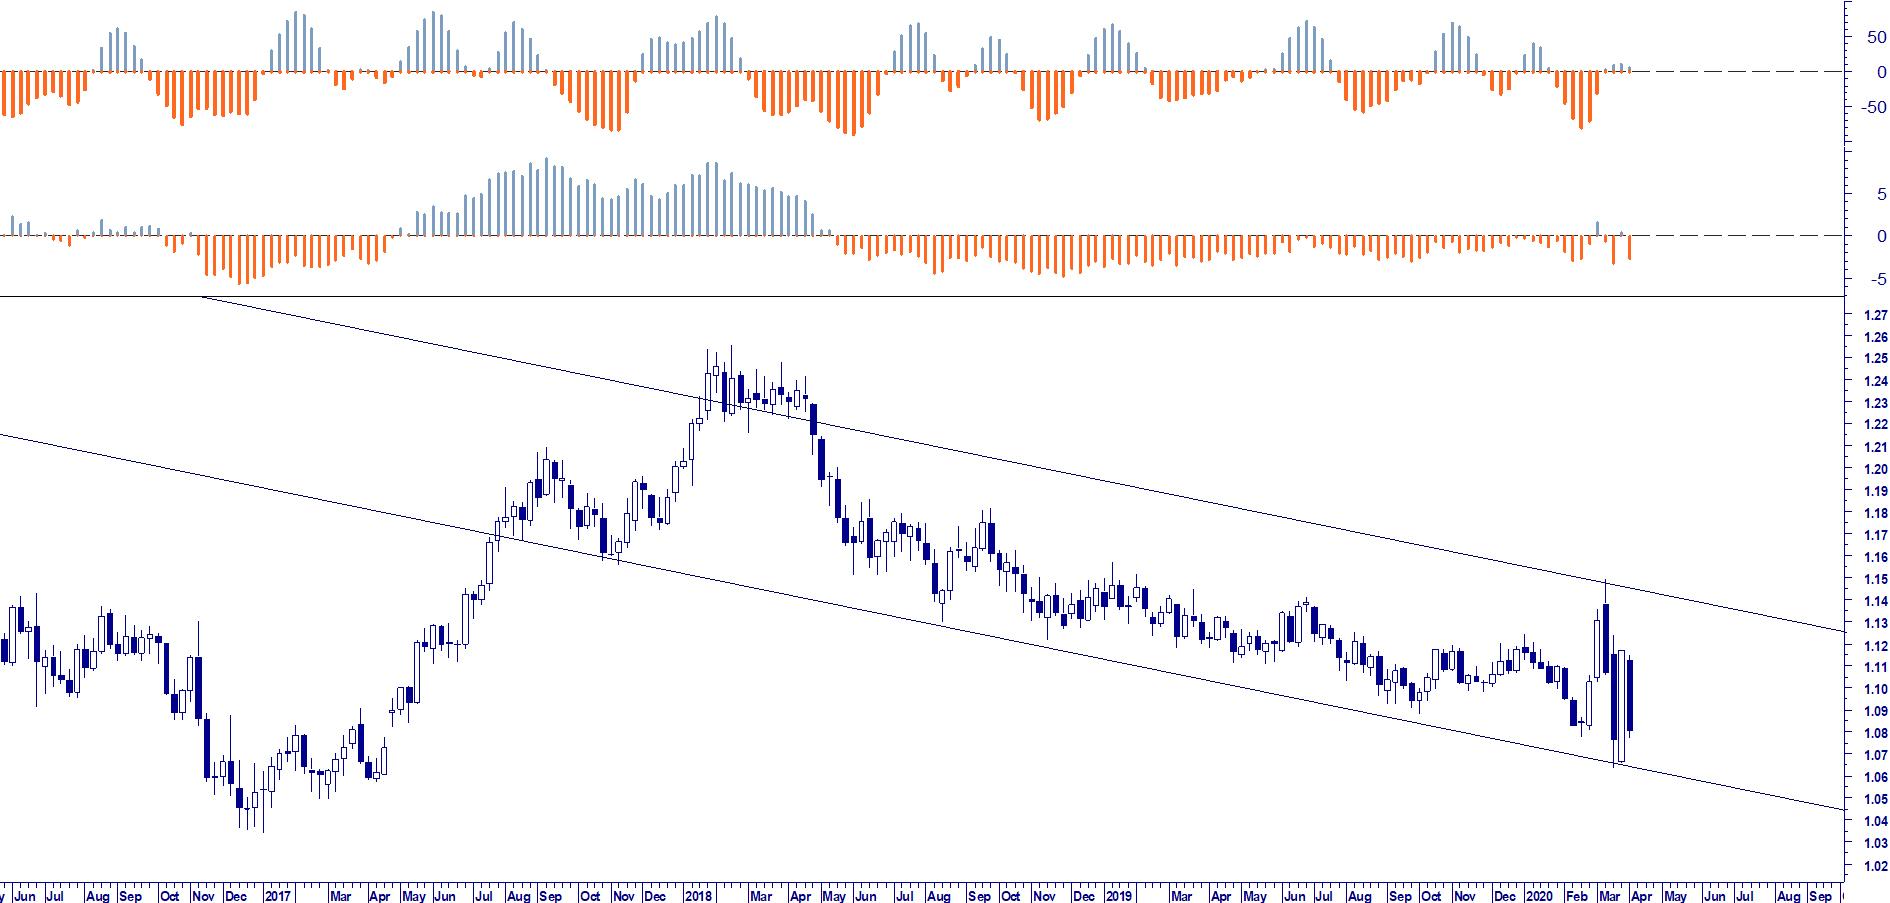 WB FX RISK MANAGEMENT: EUR USD